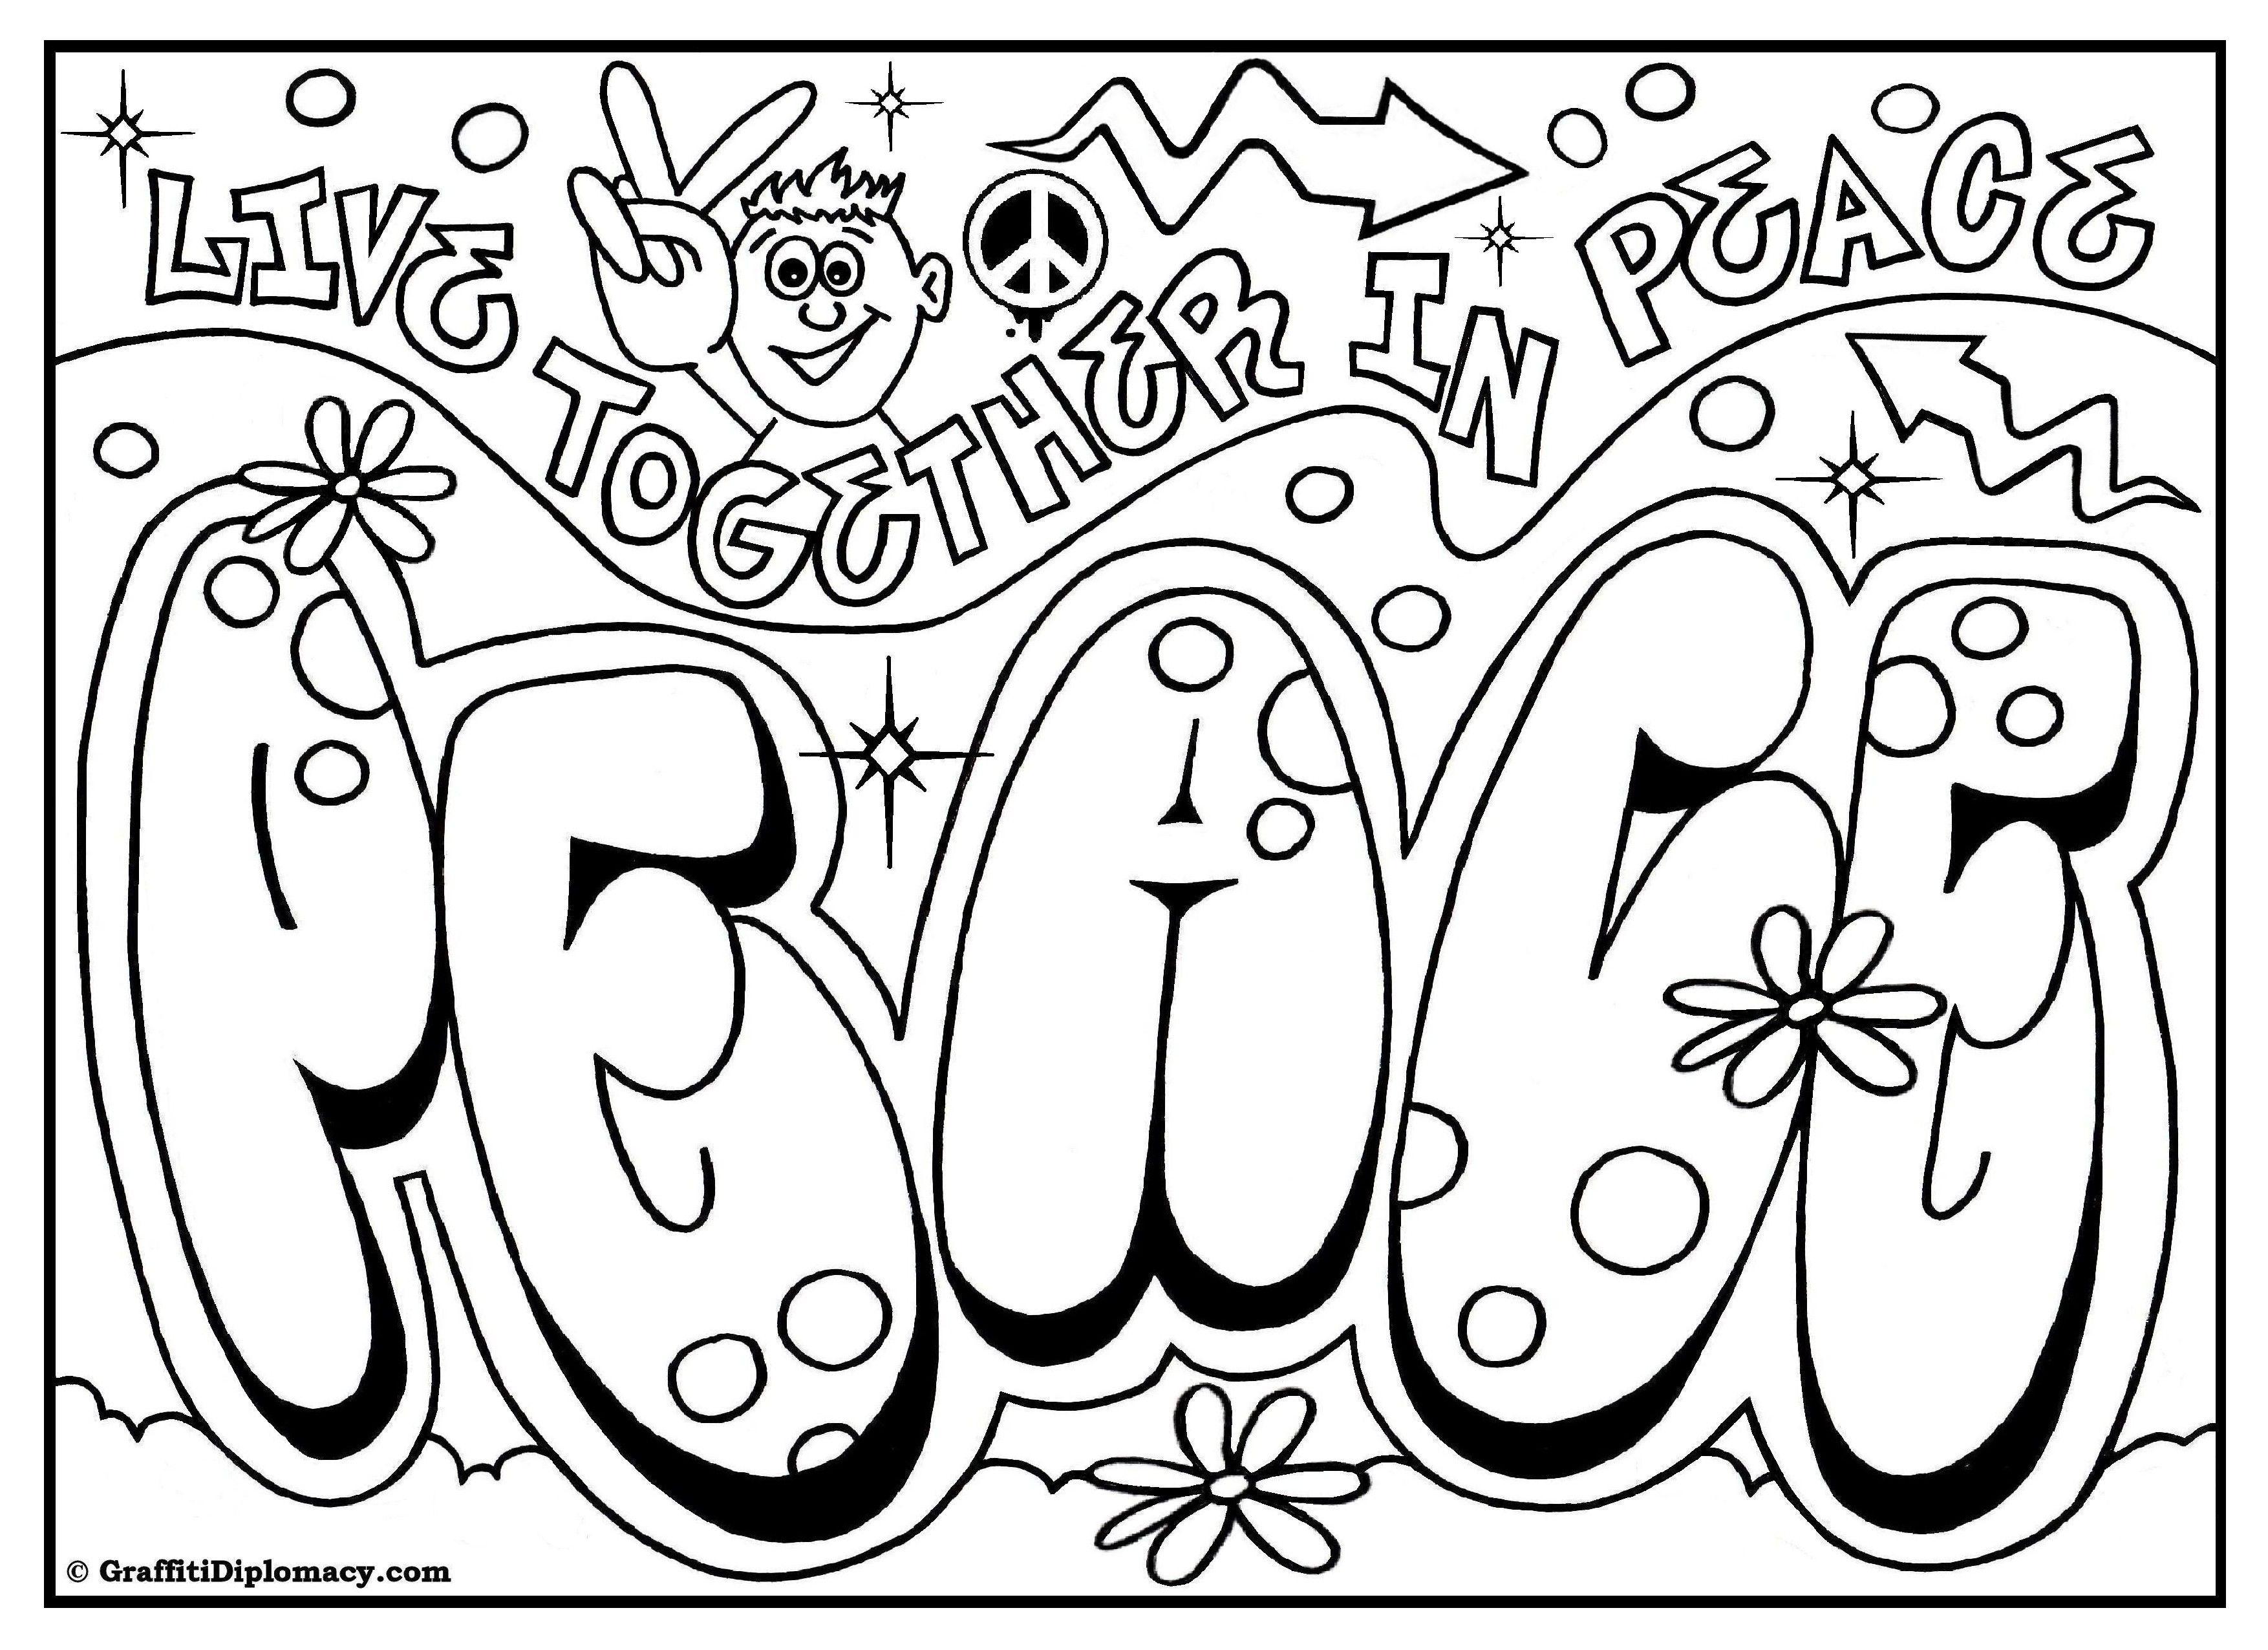 Peace Graffiti, Free Printable Coloring Page | Free Coloring Pages - Free Printable Coloring Pages For Teens